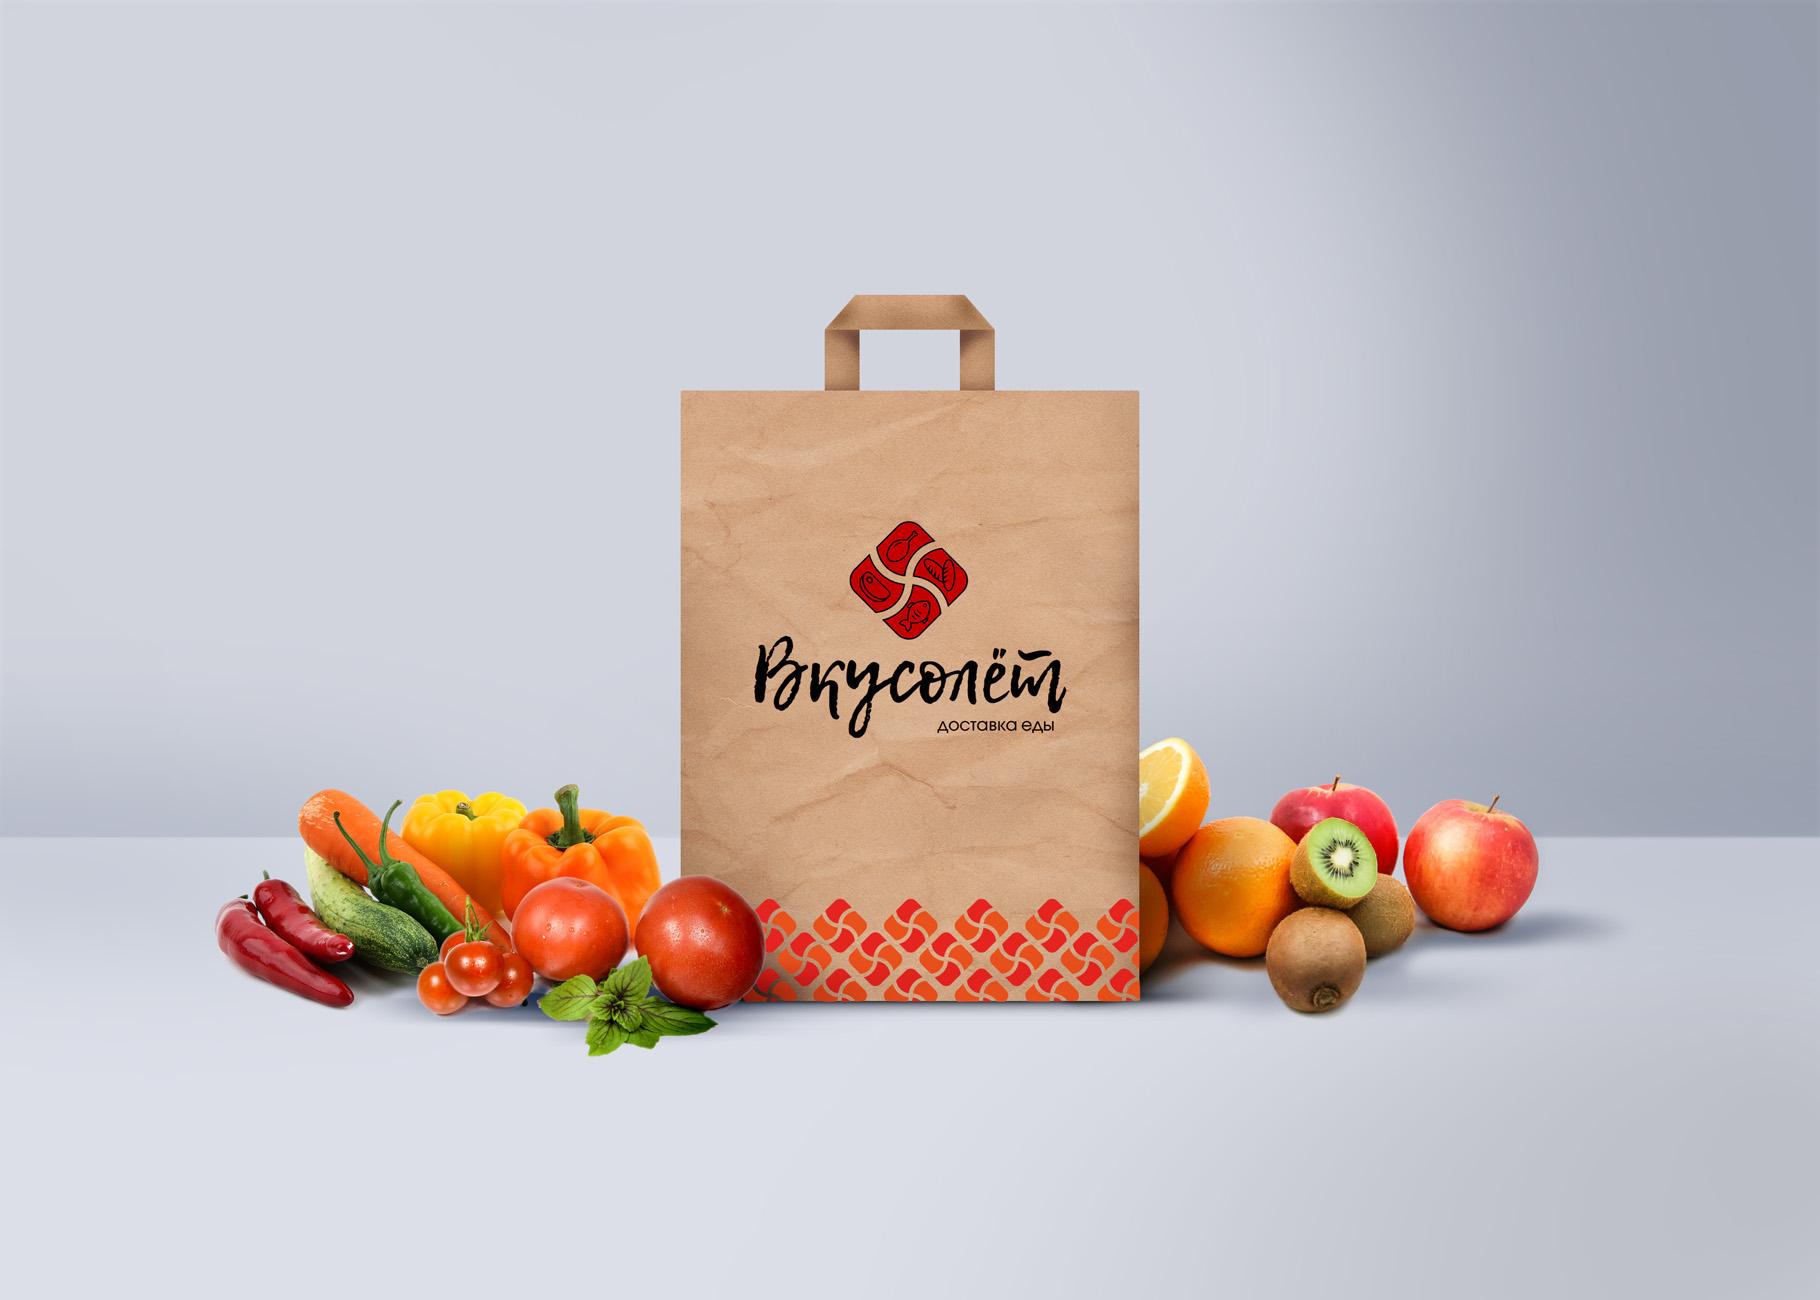 Логотип для доставки еды фото f_28559d79bfa01a07.jpg